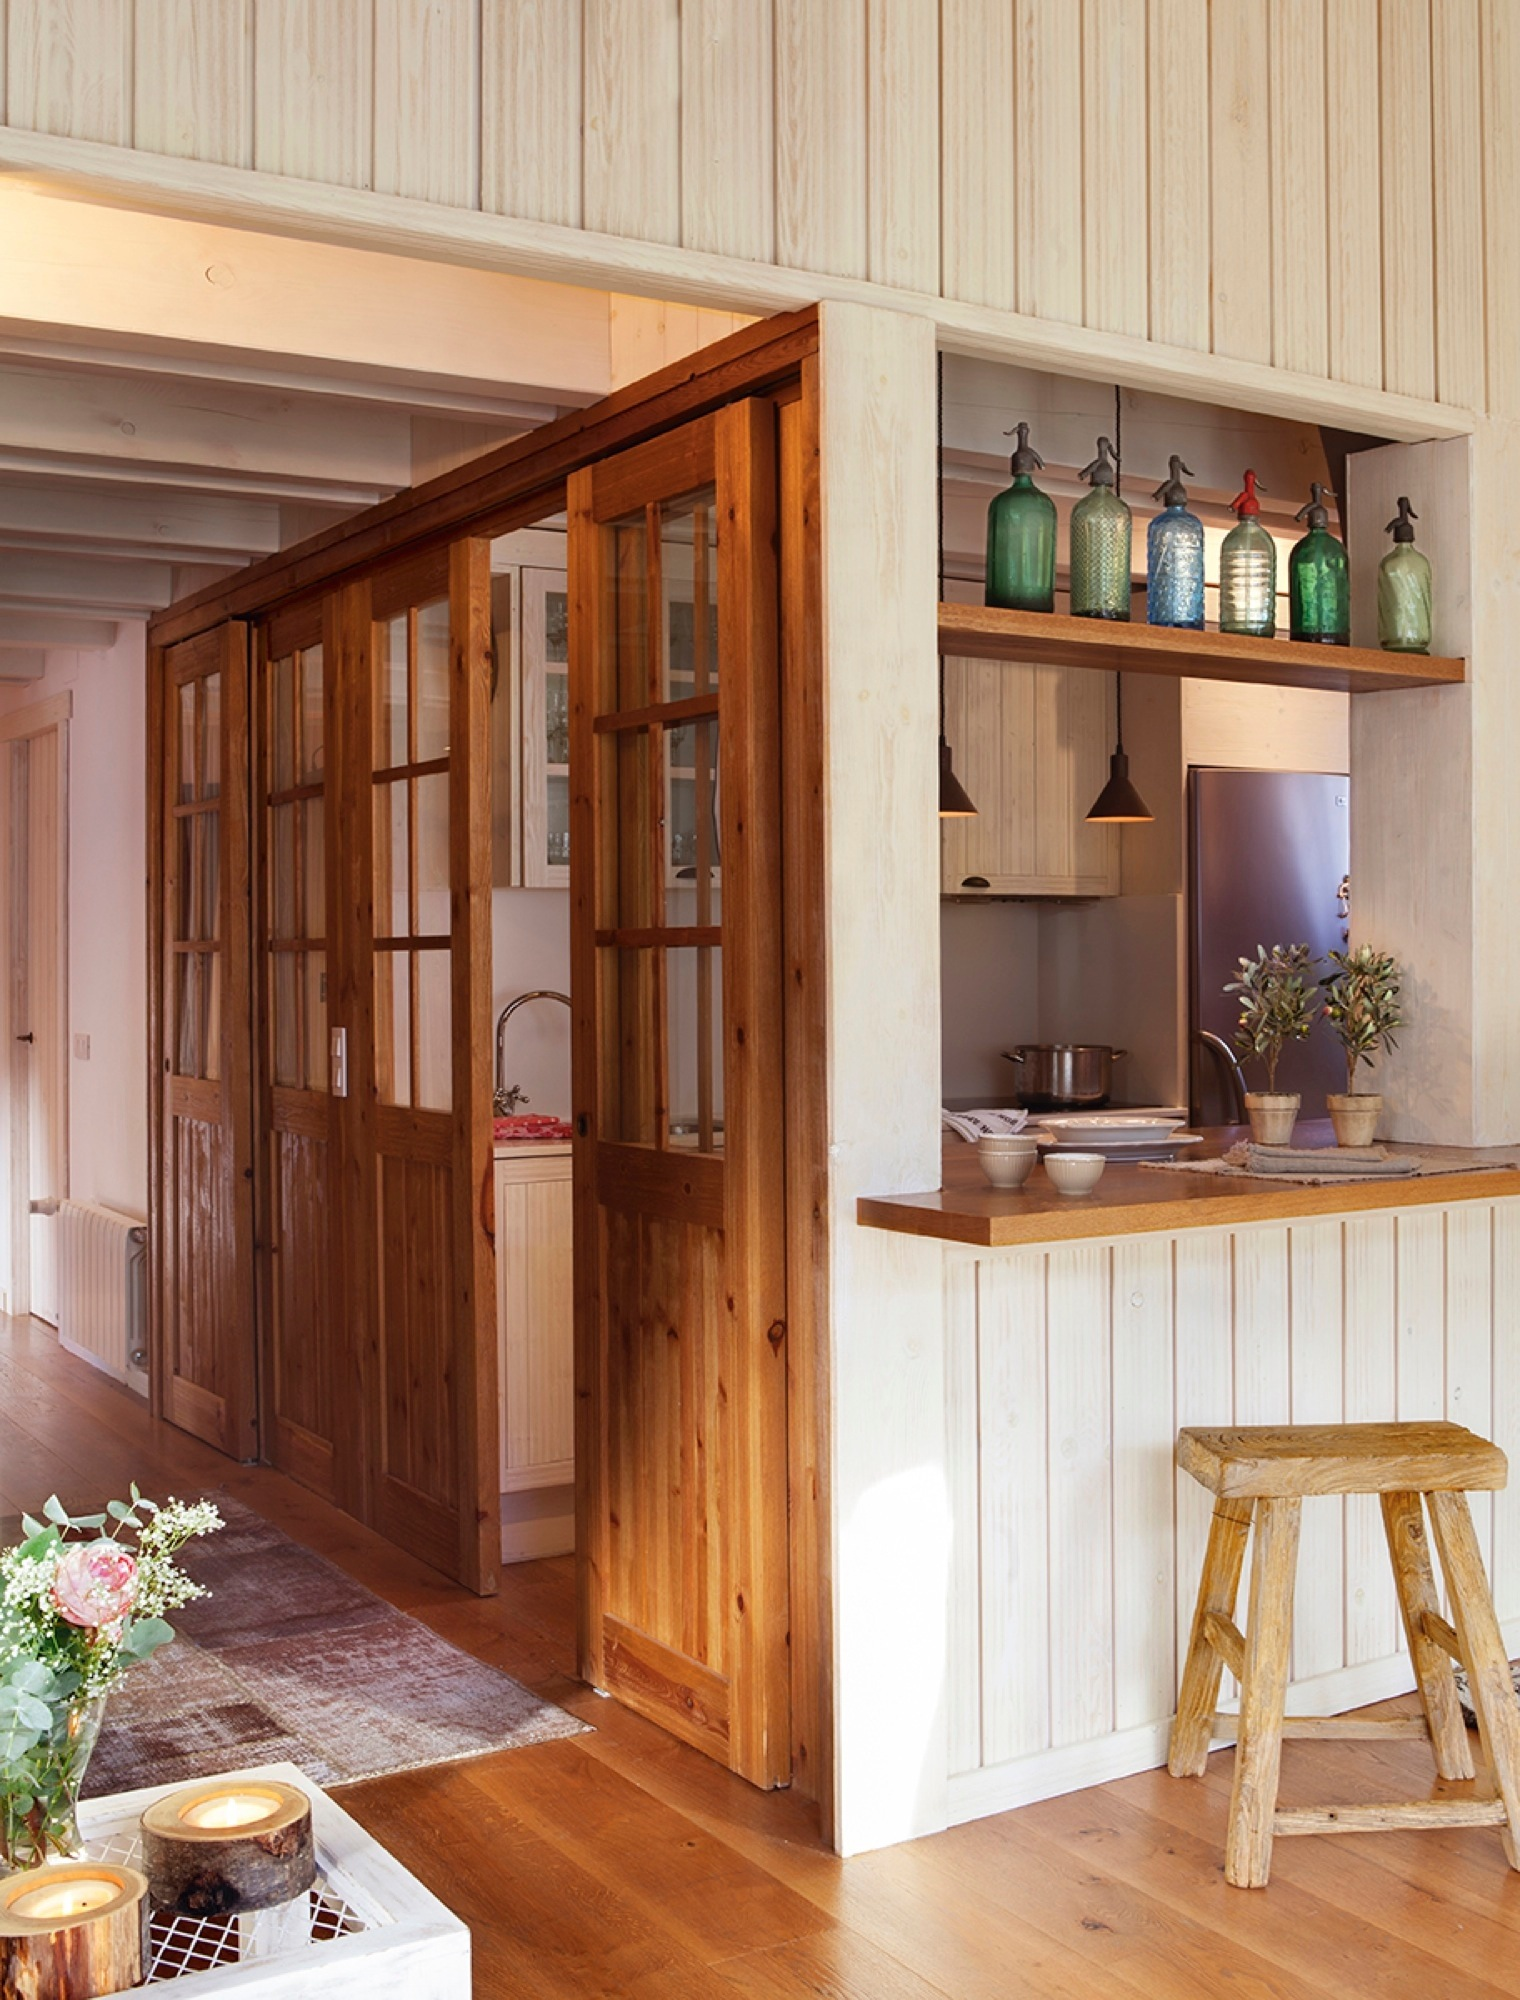 Puertas correderas de cristal de madera o empotradas for Puertas idea